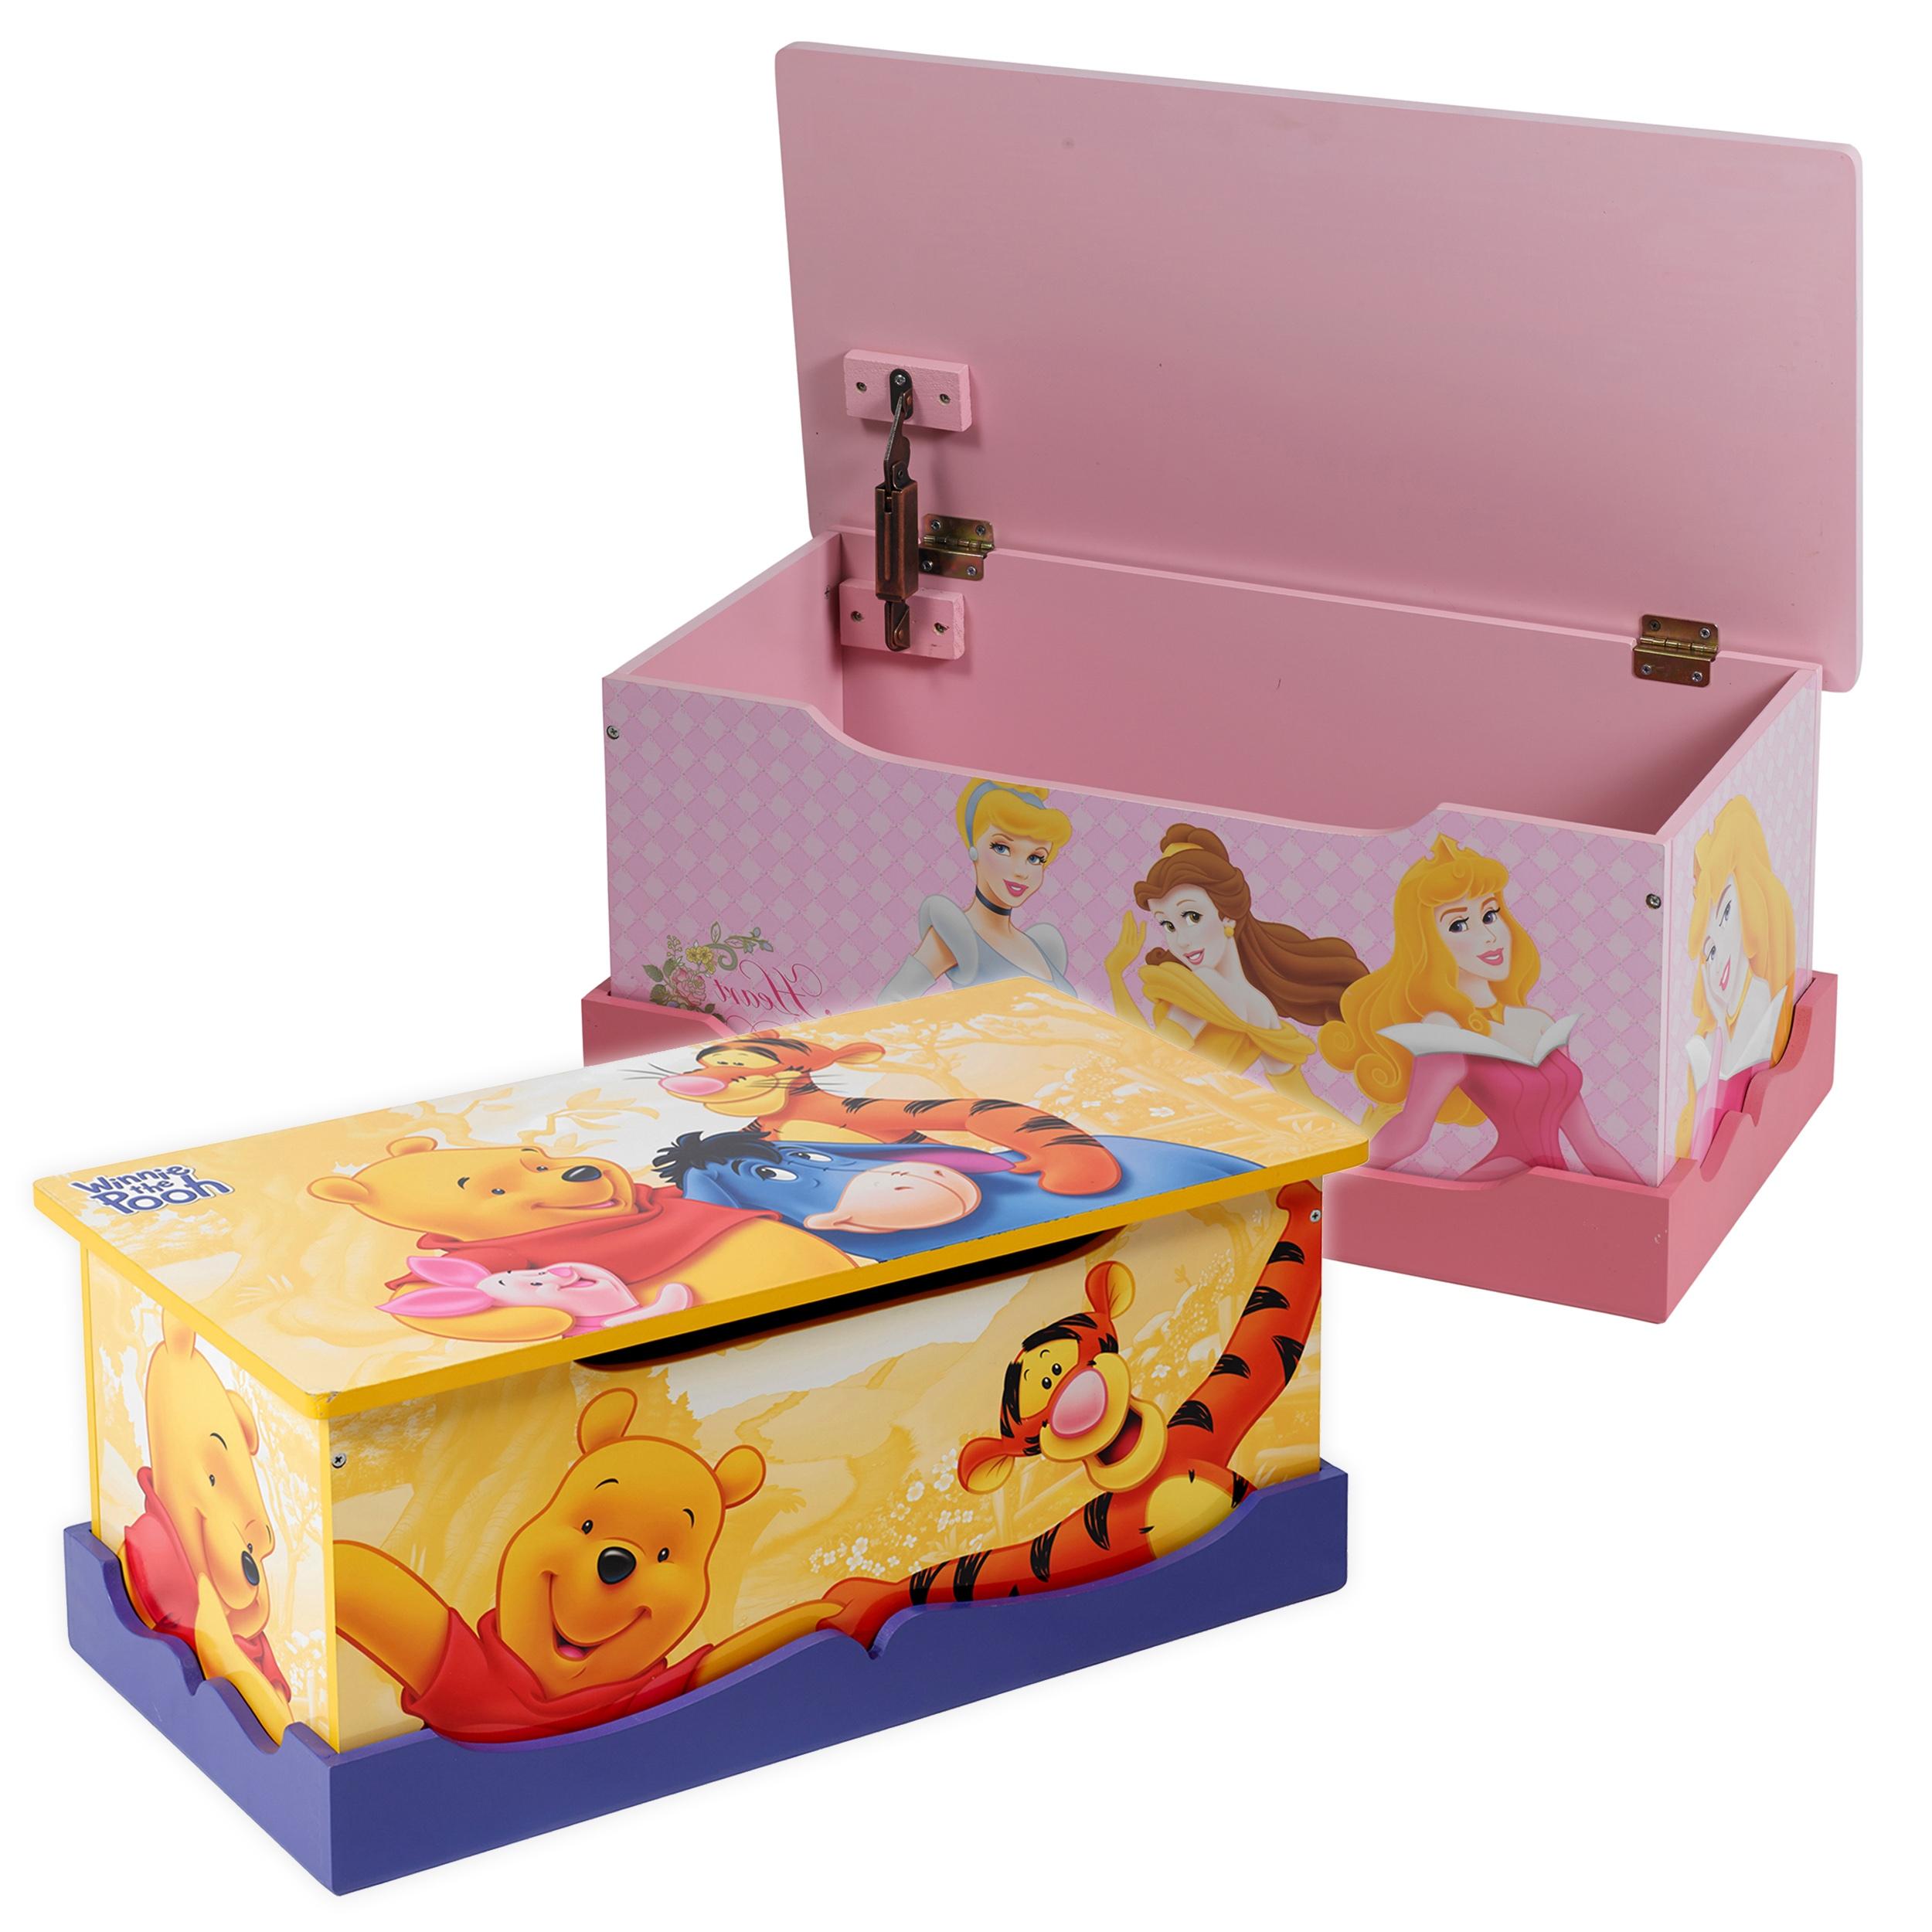 Disney MDF Wooden Chest Toy Storage Box Ottoman Seat Bedroom Furniture ...